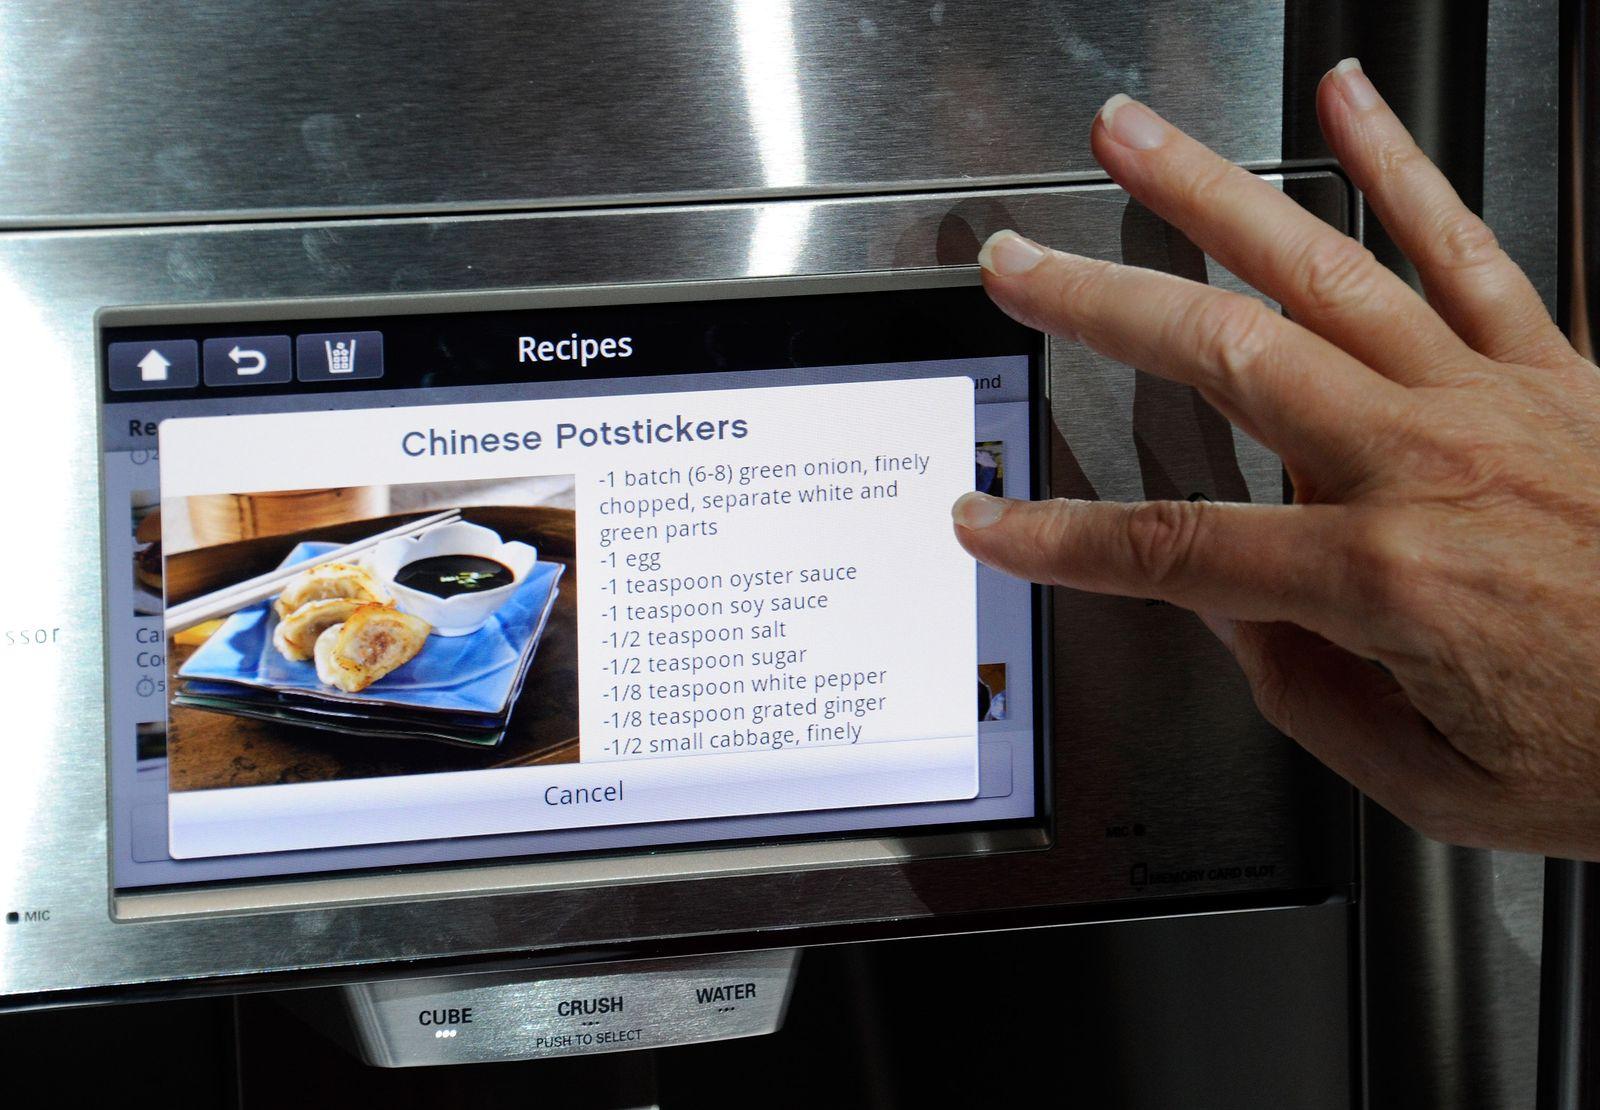 Kühlschrank mit Touchscreen / CES 2012